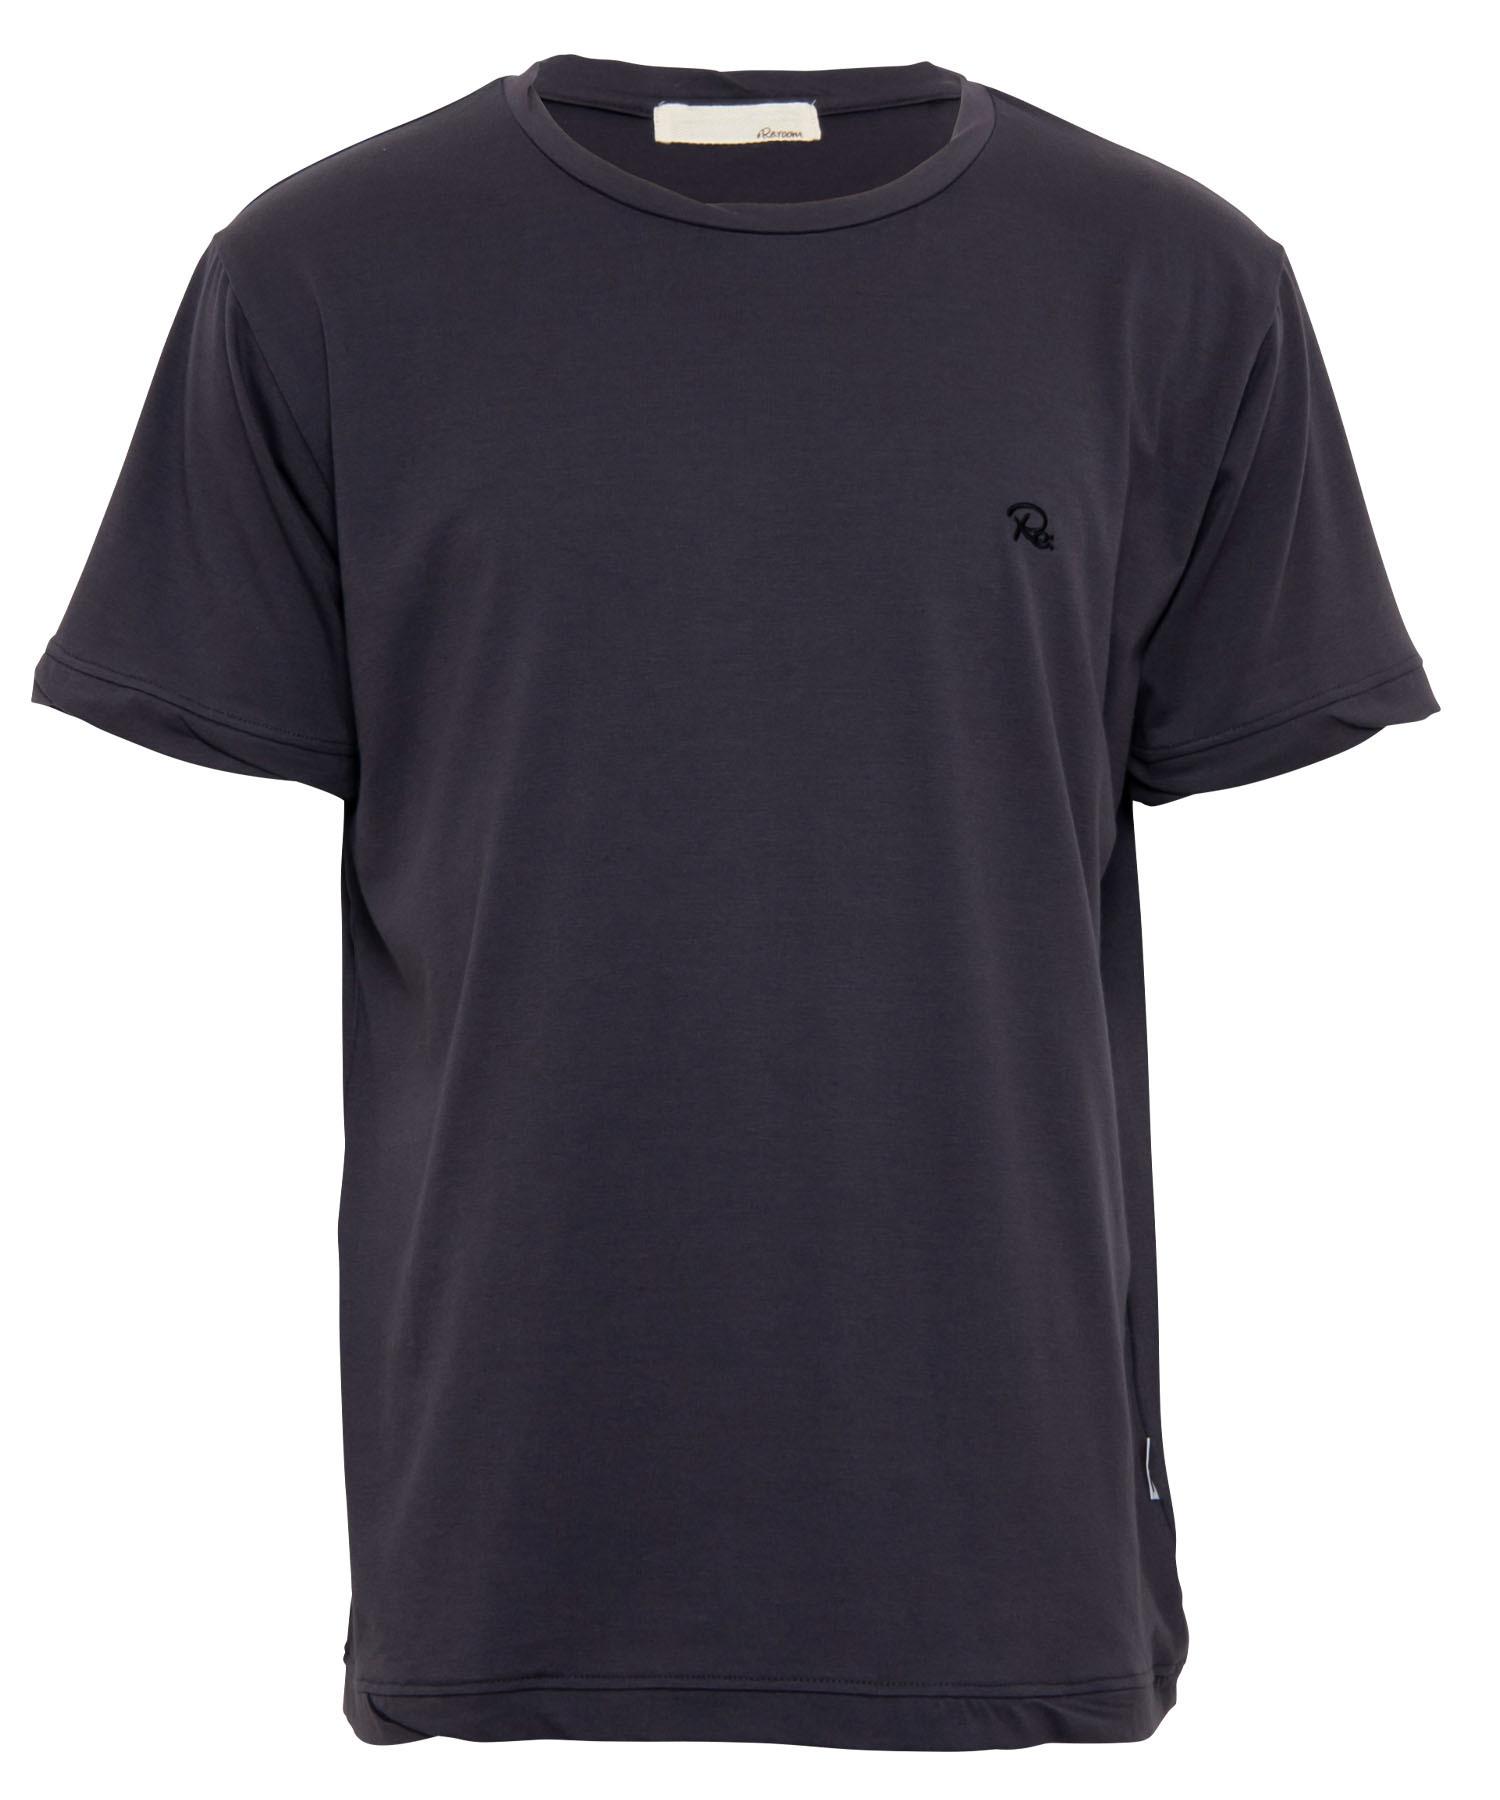 TWIST RIB Re: ONE POINT T-shirt[REC401]